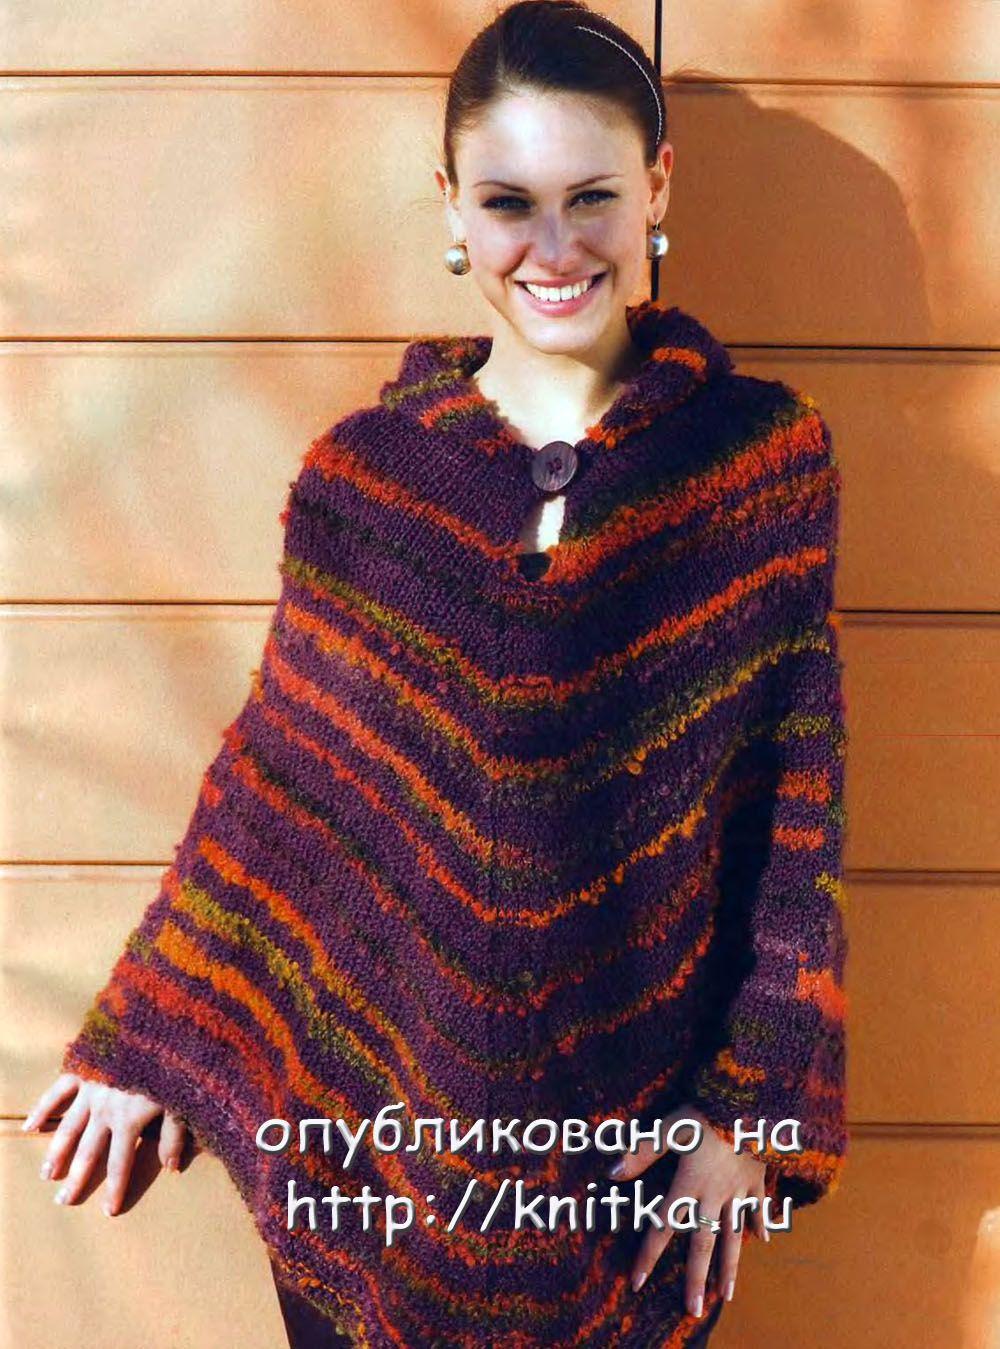 http://knitka.ru/knitting-schemes-pictures/2011/04/polosatoe_poncho1.jpg